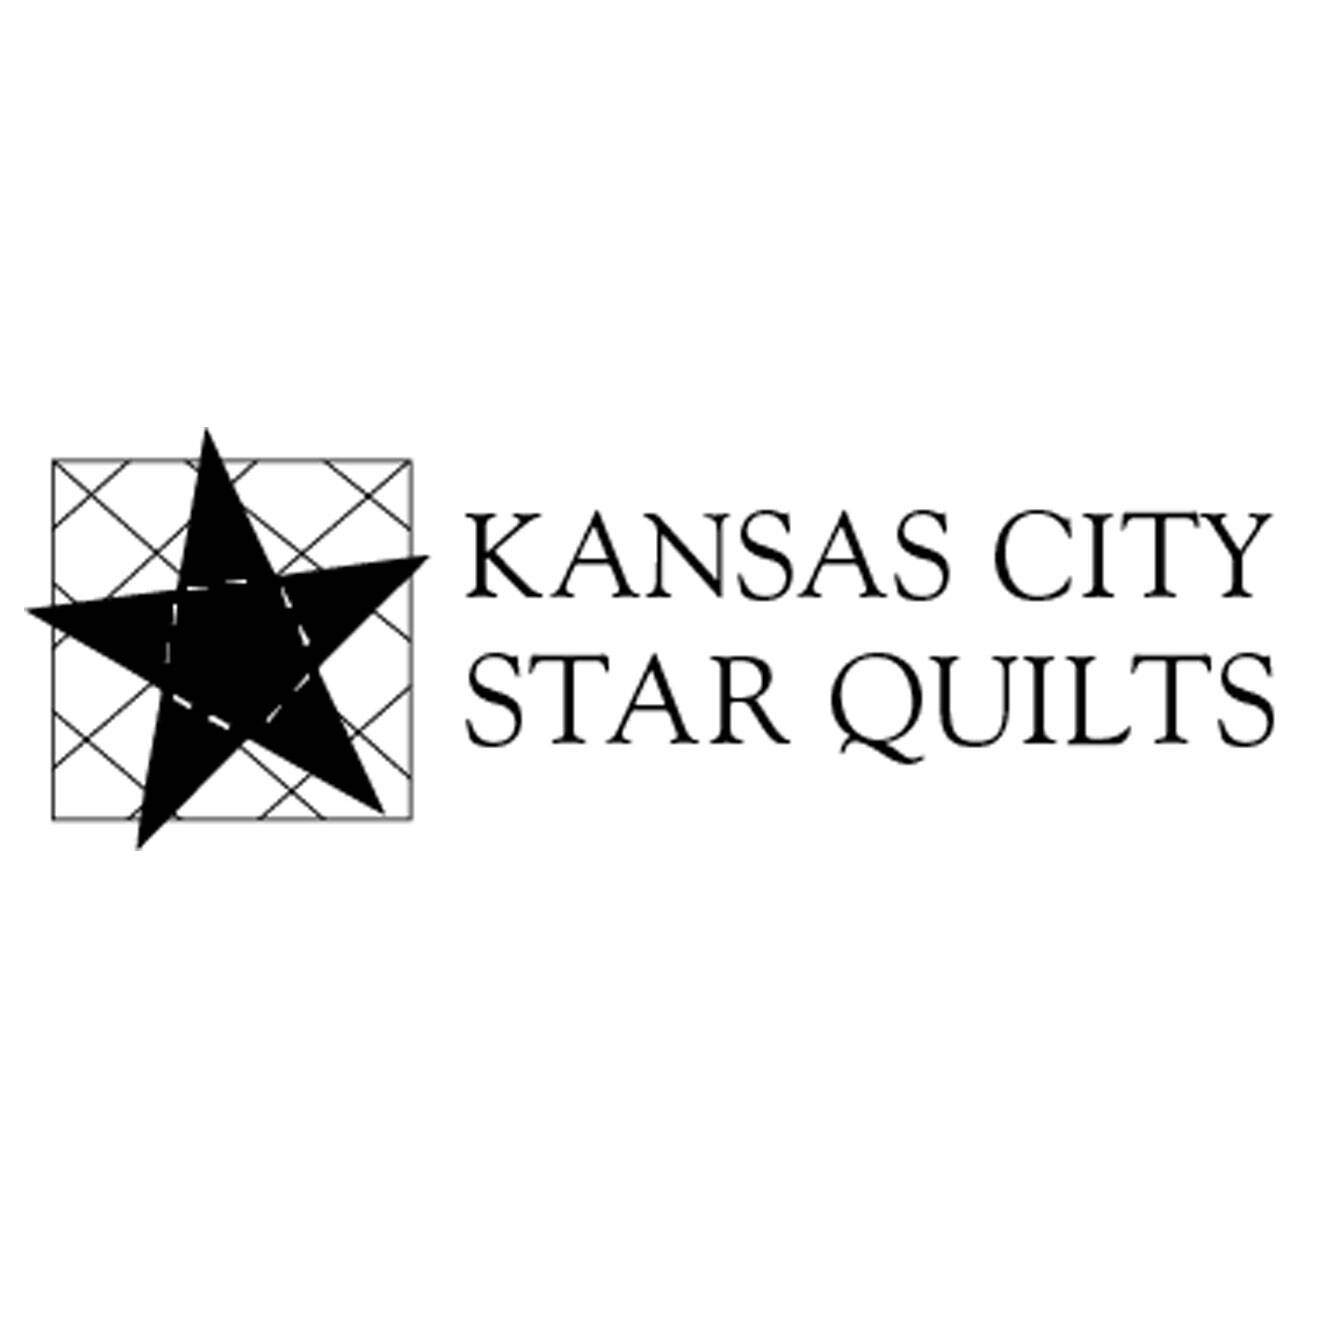 Kansas City Star Quilts